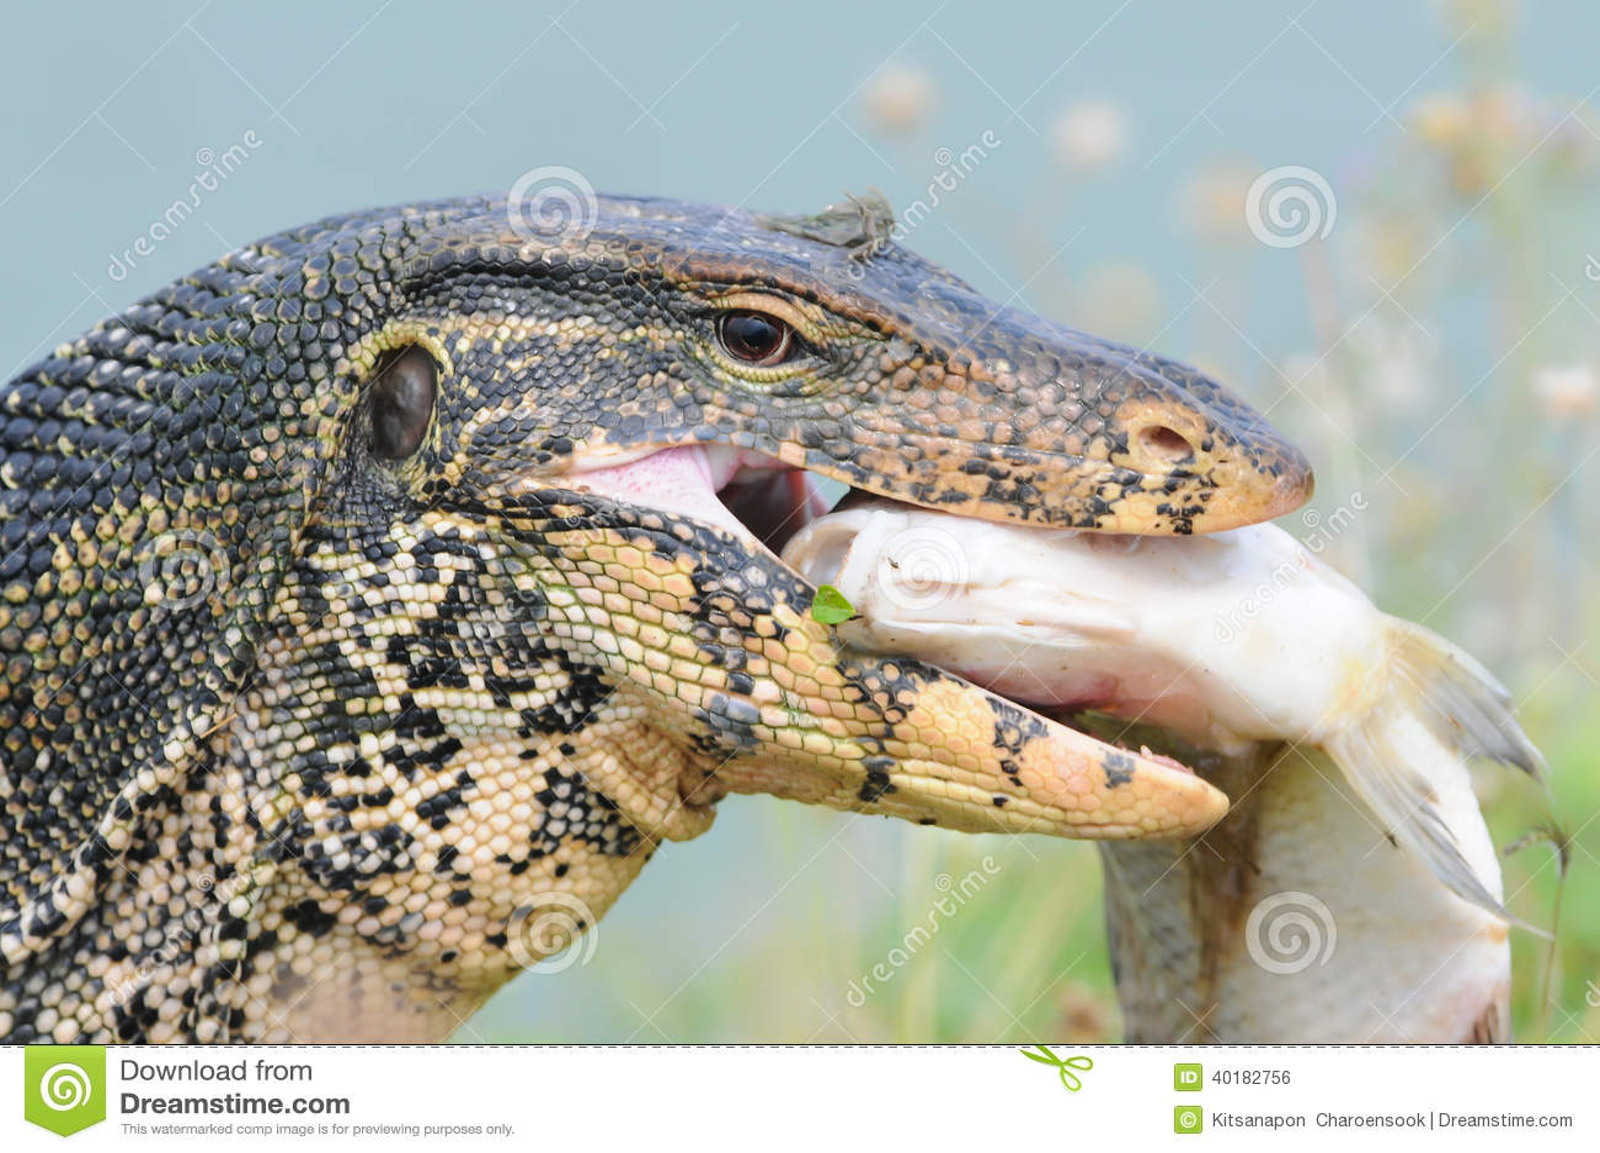 Monitor lizard eating fish stock photo image 40182756 for Water lizard fish